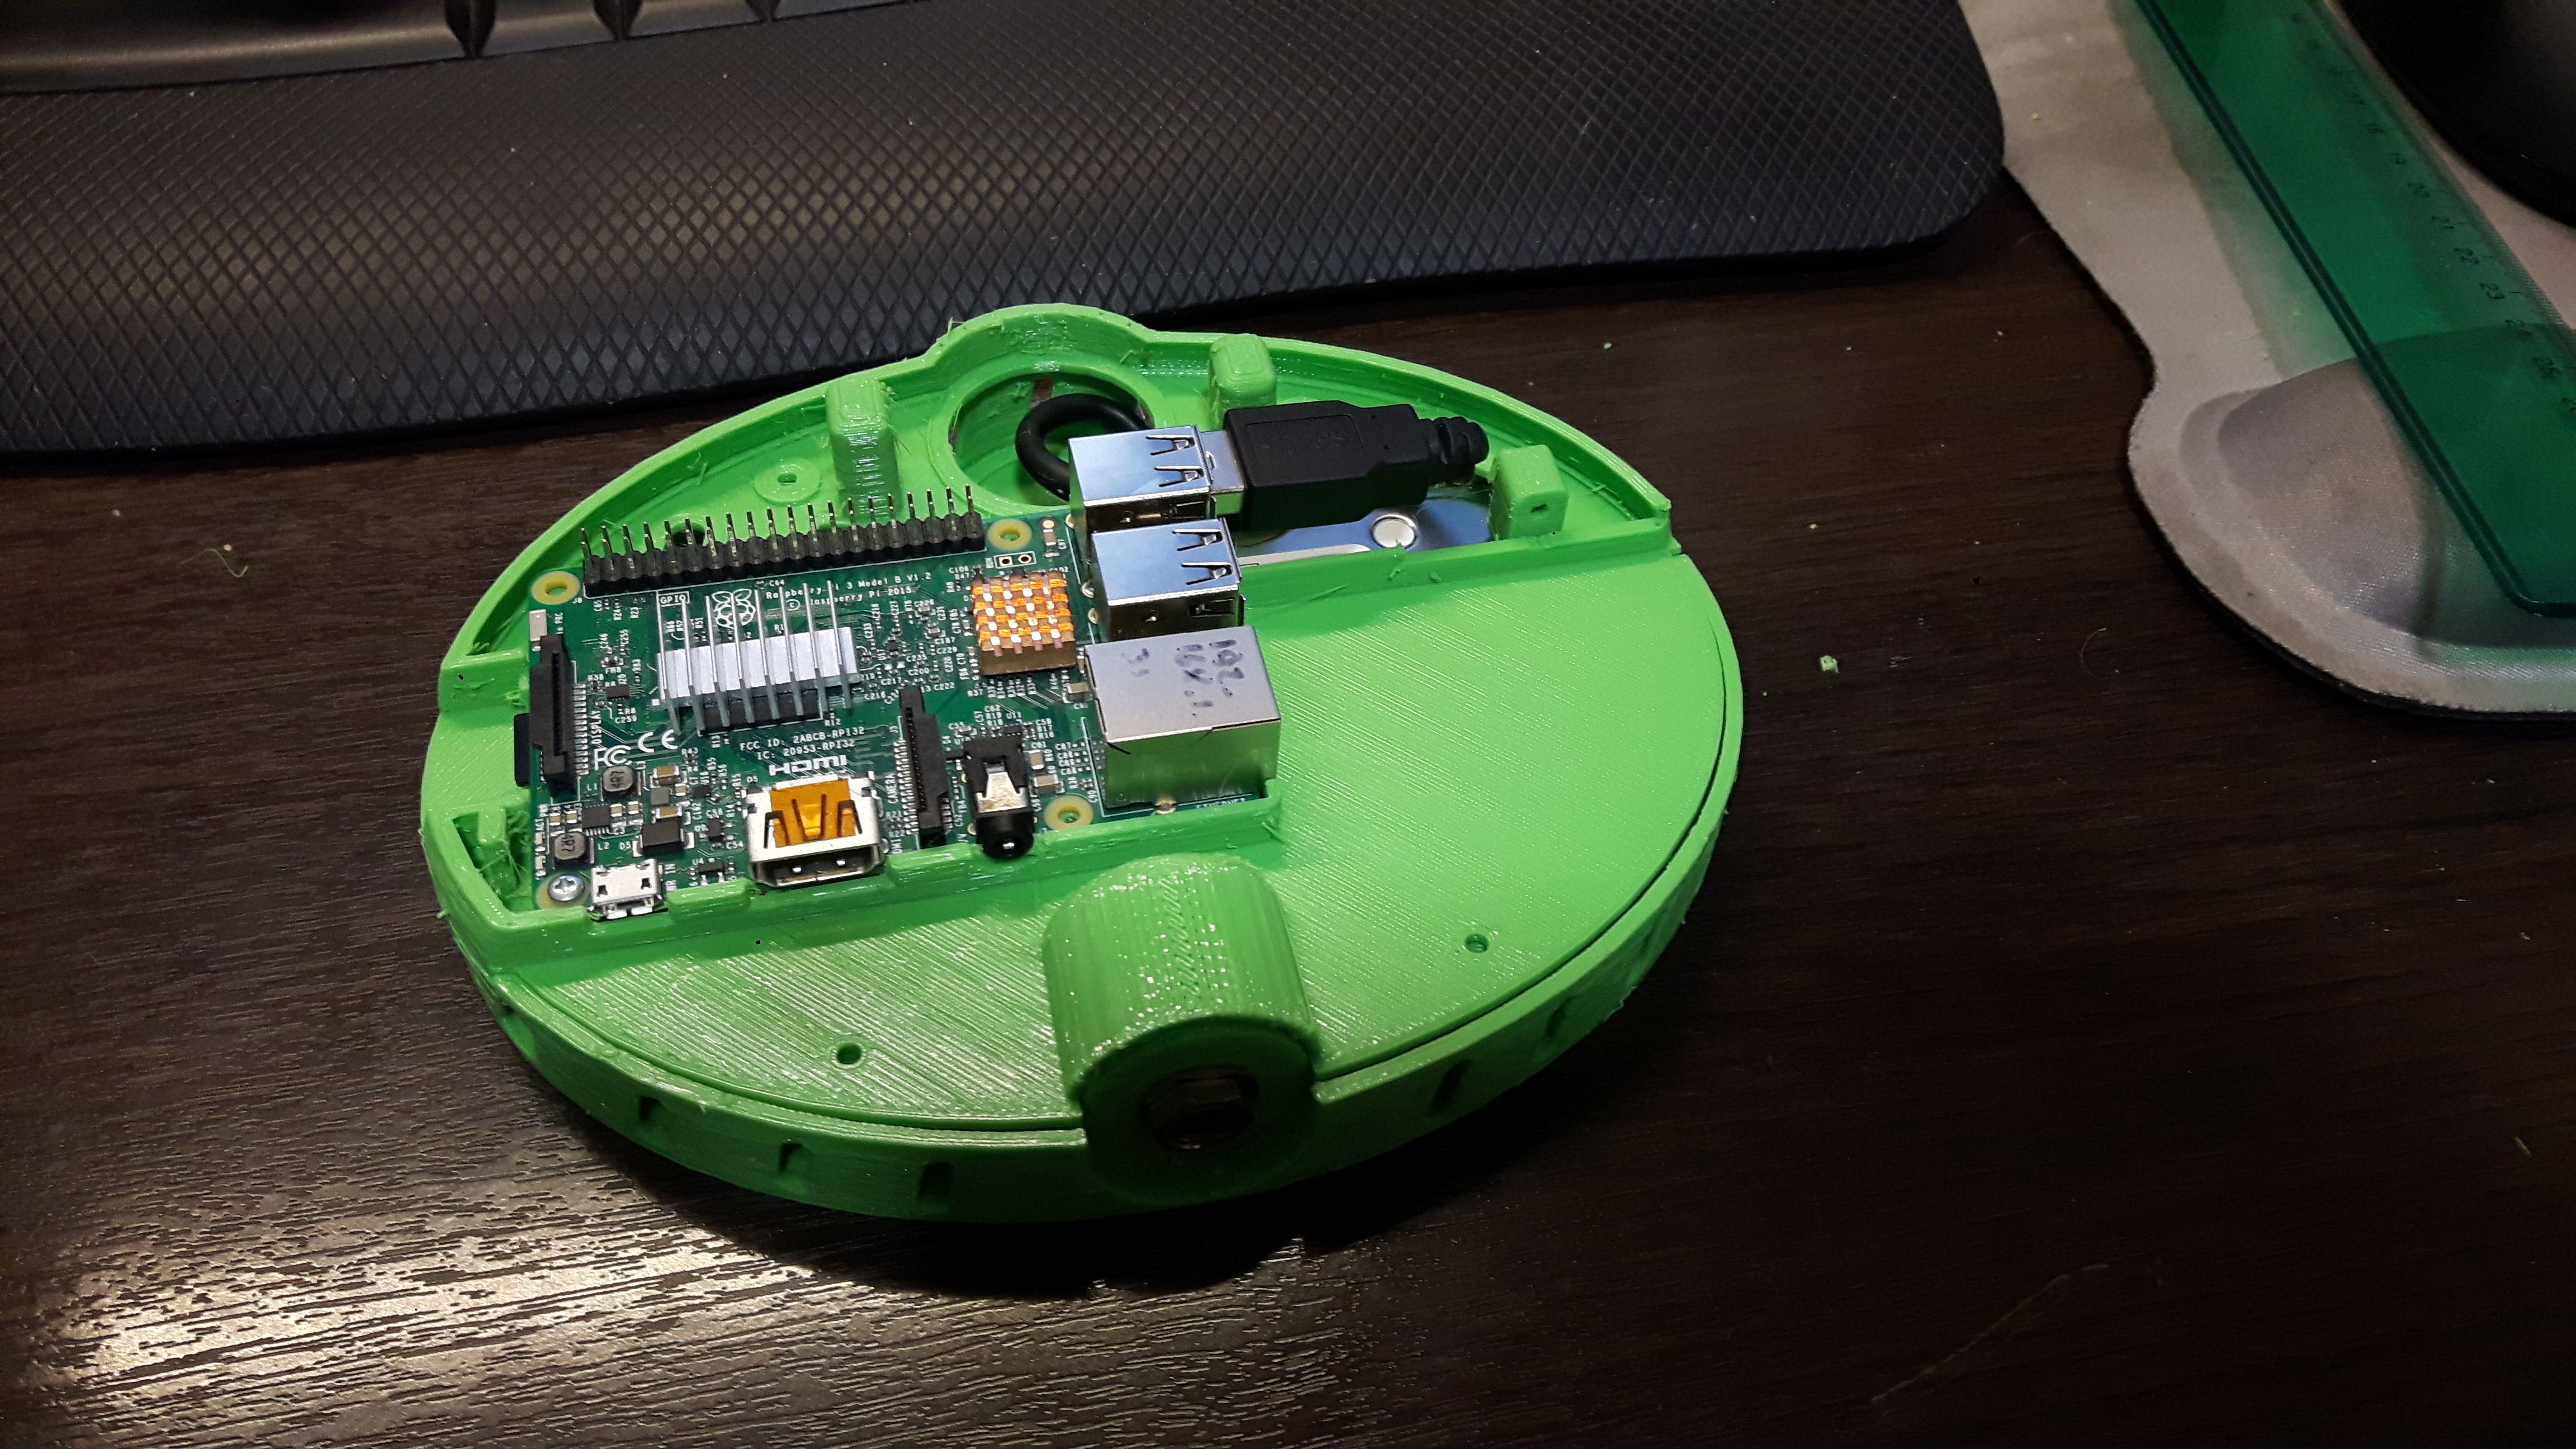 20181005_204955.jpg Download free STL file Raspberry Pi modern case w/ hard drive compartment & VESA holes -  Enjoy! • 3D print model, raulrrojas